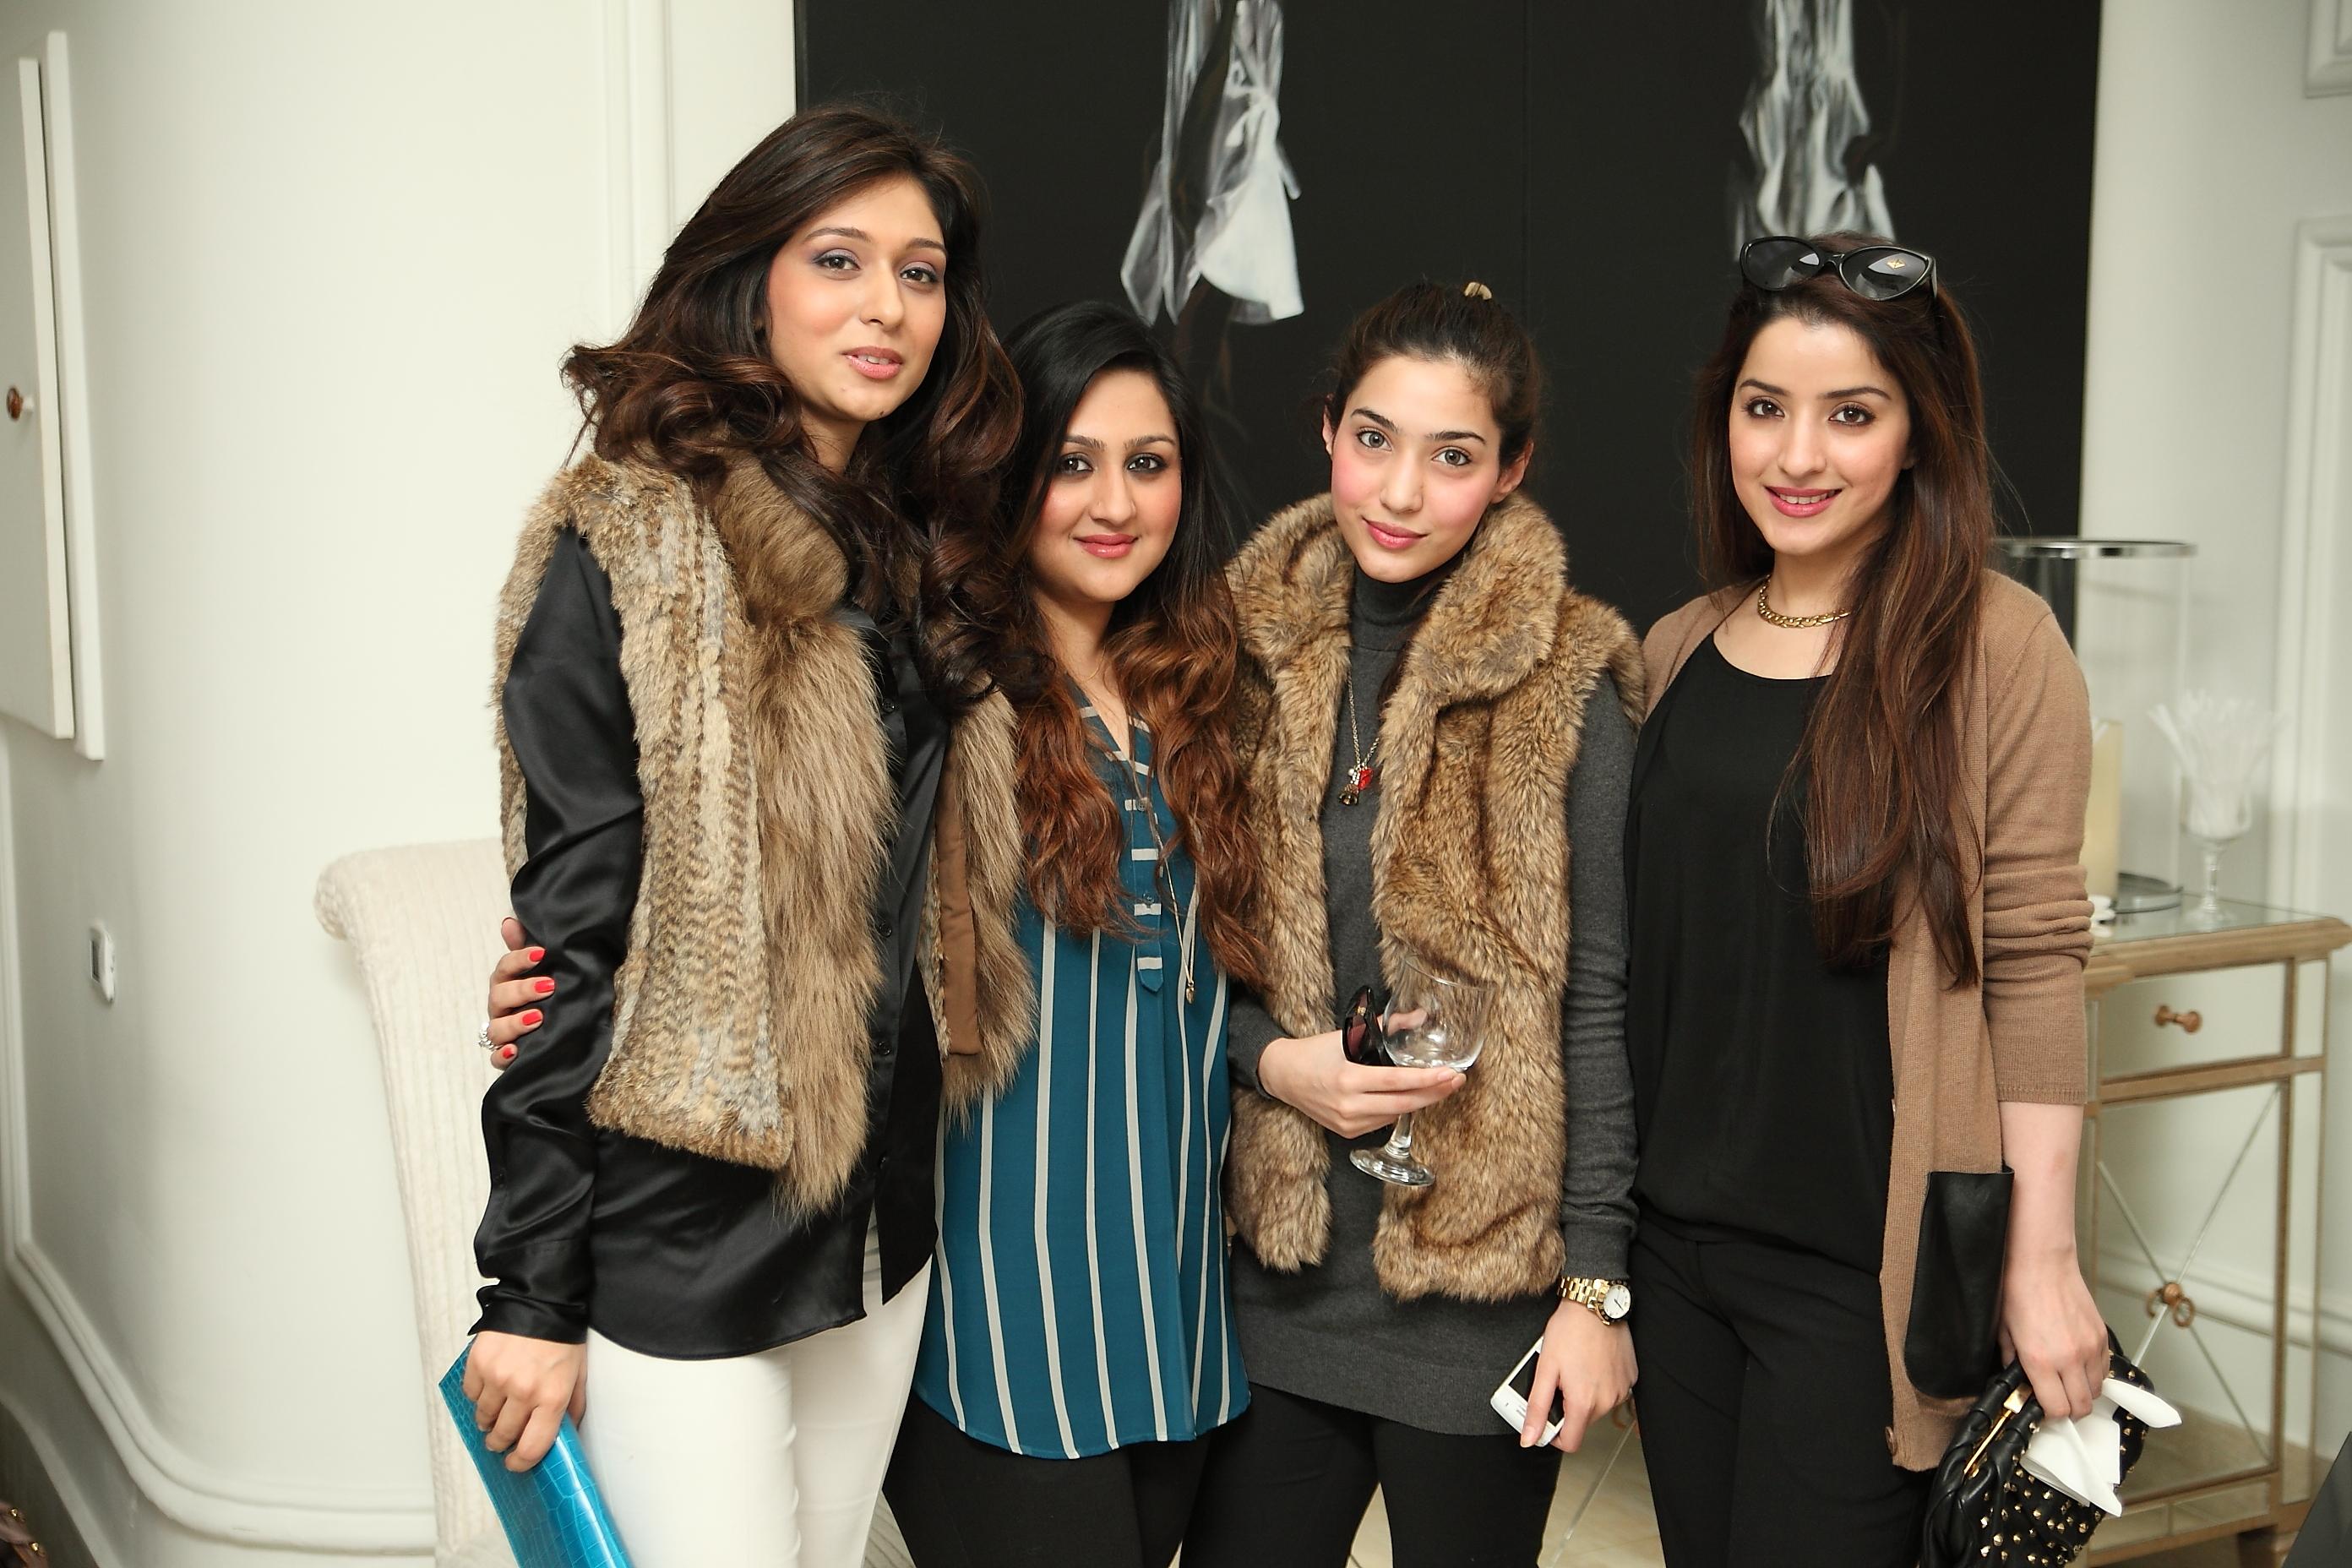 Areeba Magsi, Shazreh Khalid, Rabia Khan and Tina Khan